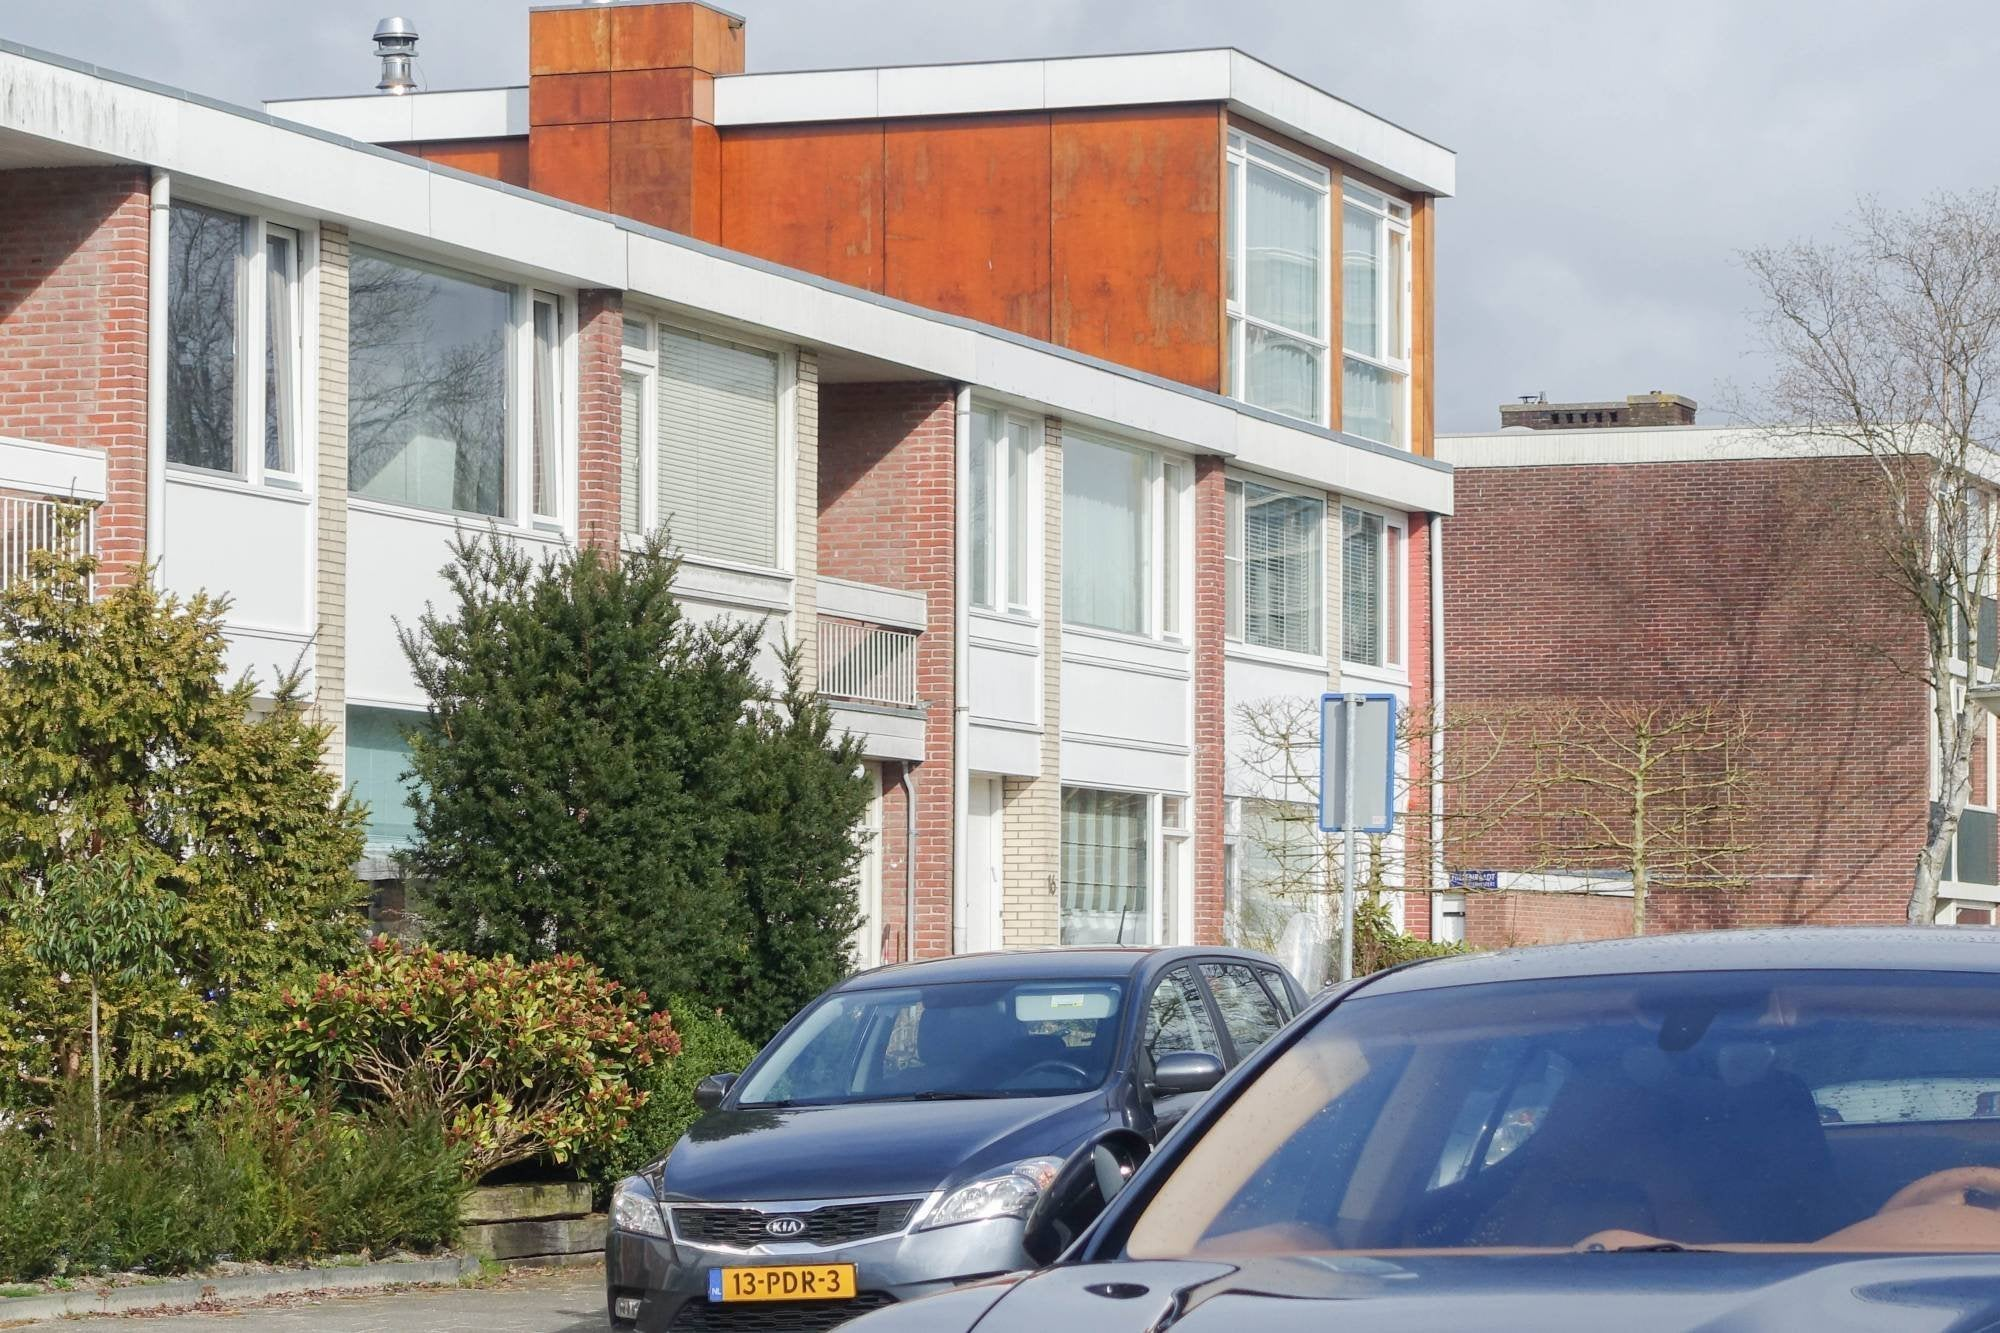 Bleijenbeek, Amsterdam